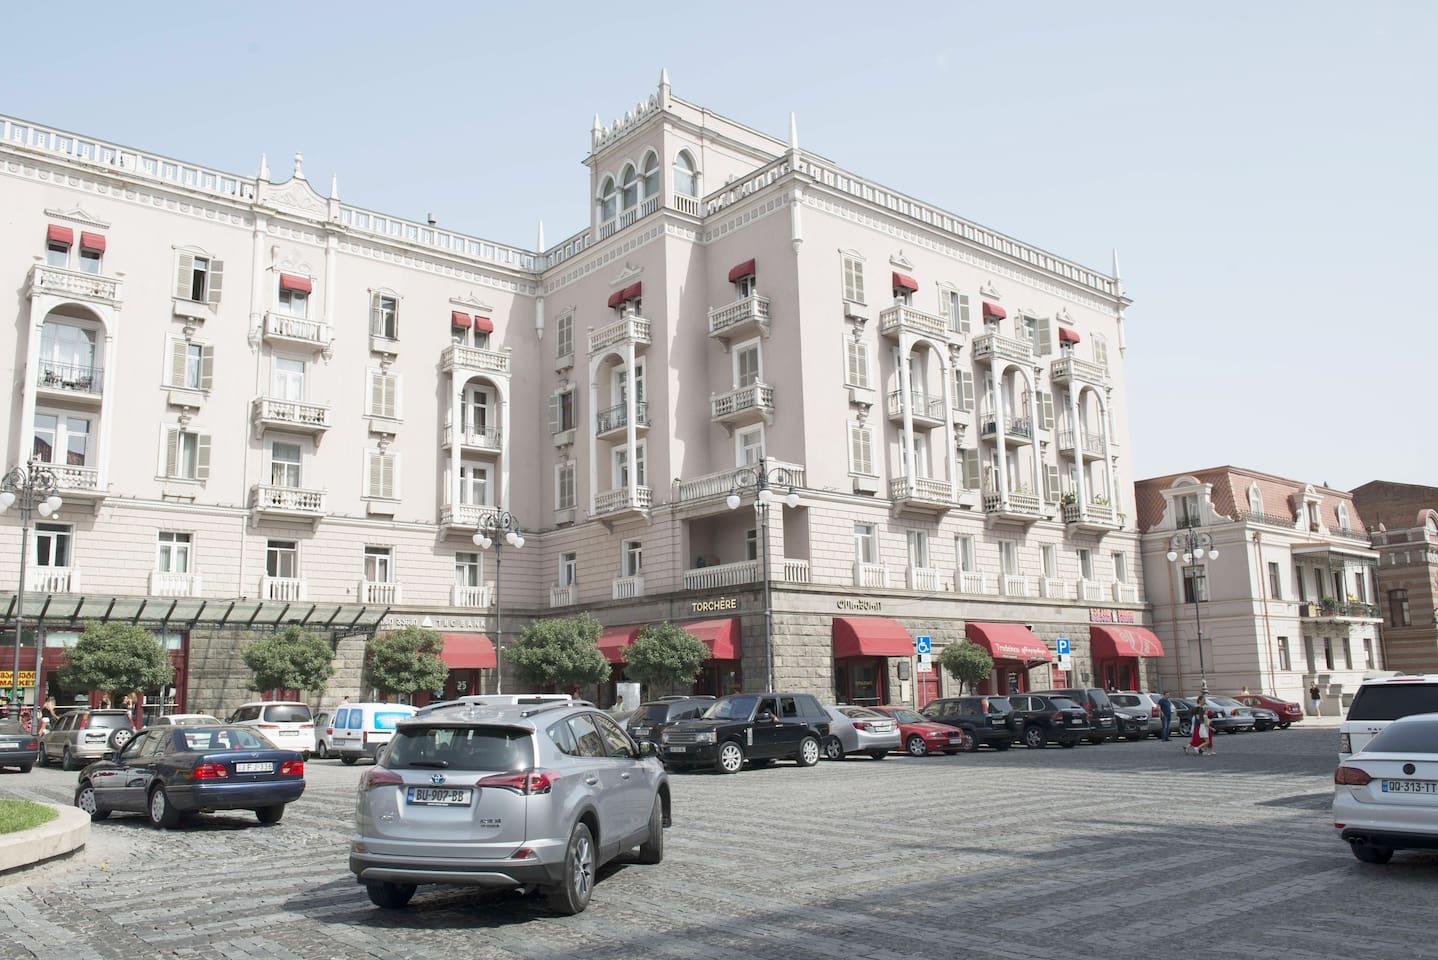 Marjanishvili Square - Entrance